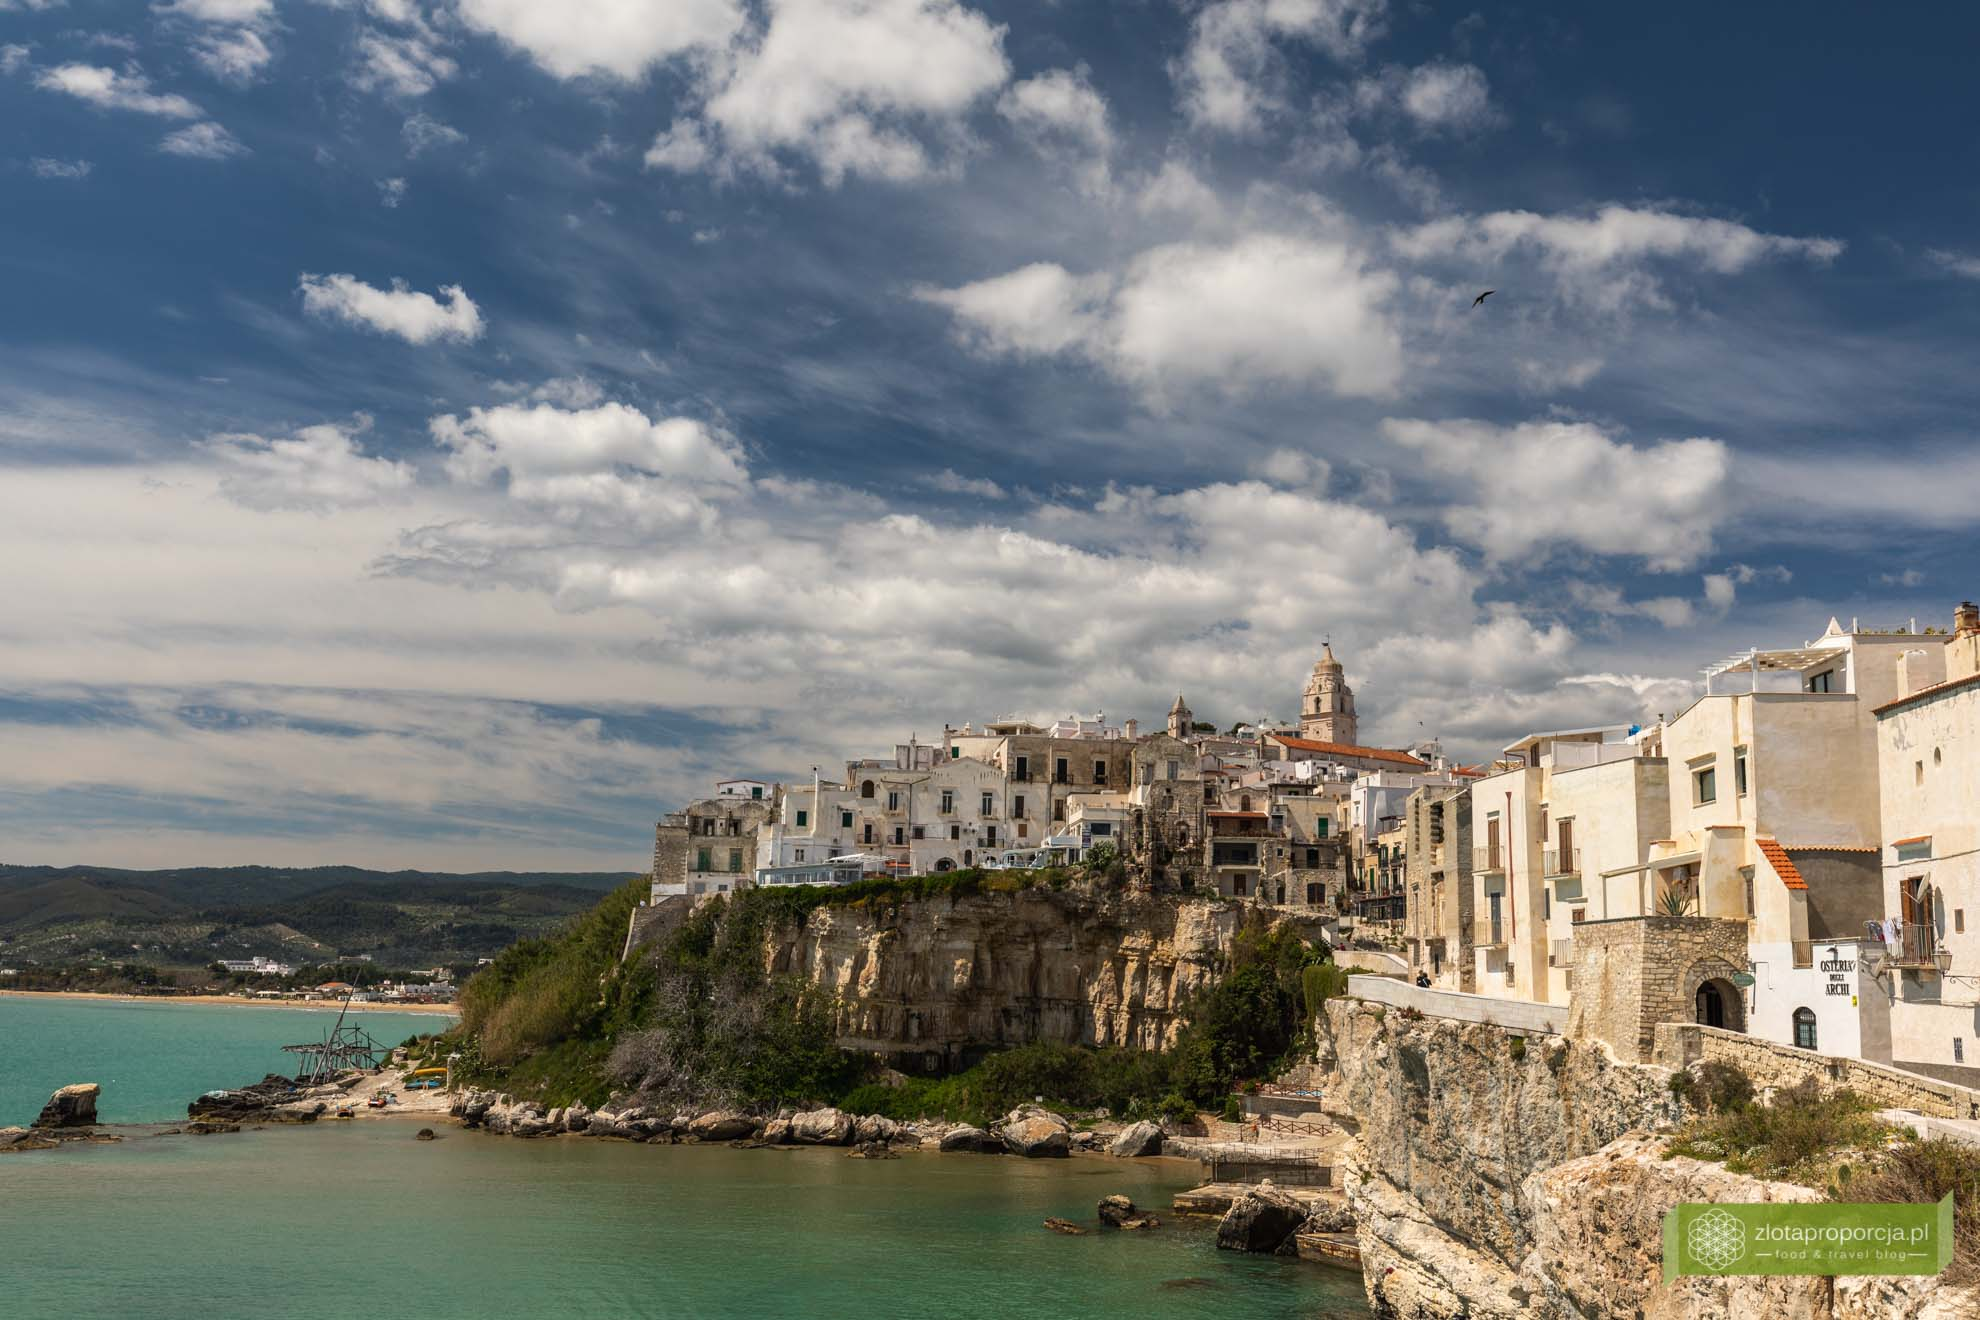 Vieste; Gargano; Apulia; atrakcje Gargano; Vieste Gargano, co zobaczyć na Gargano; atrakcje Apulii;